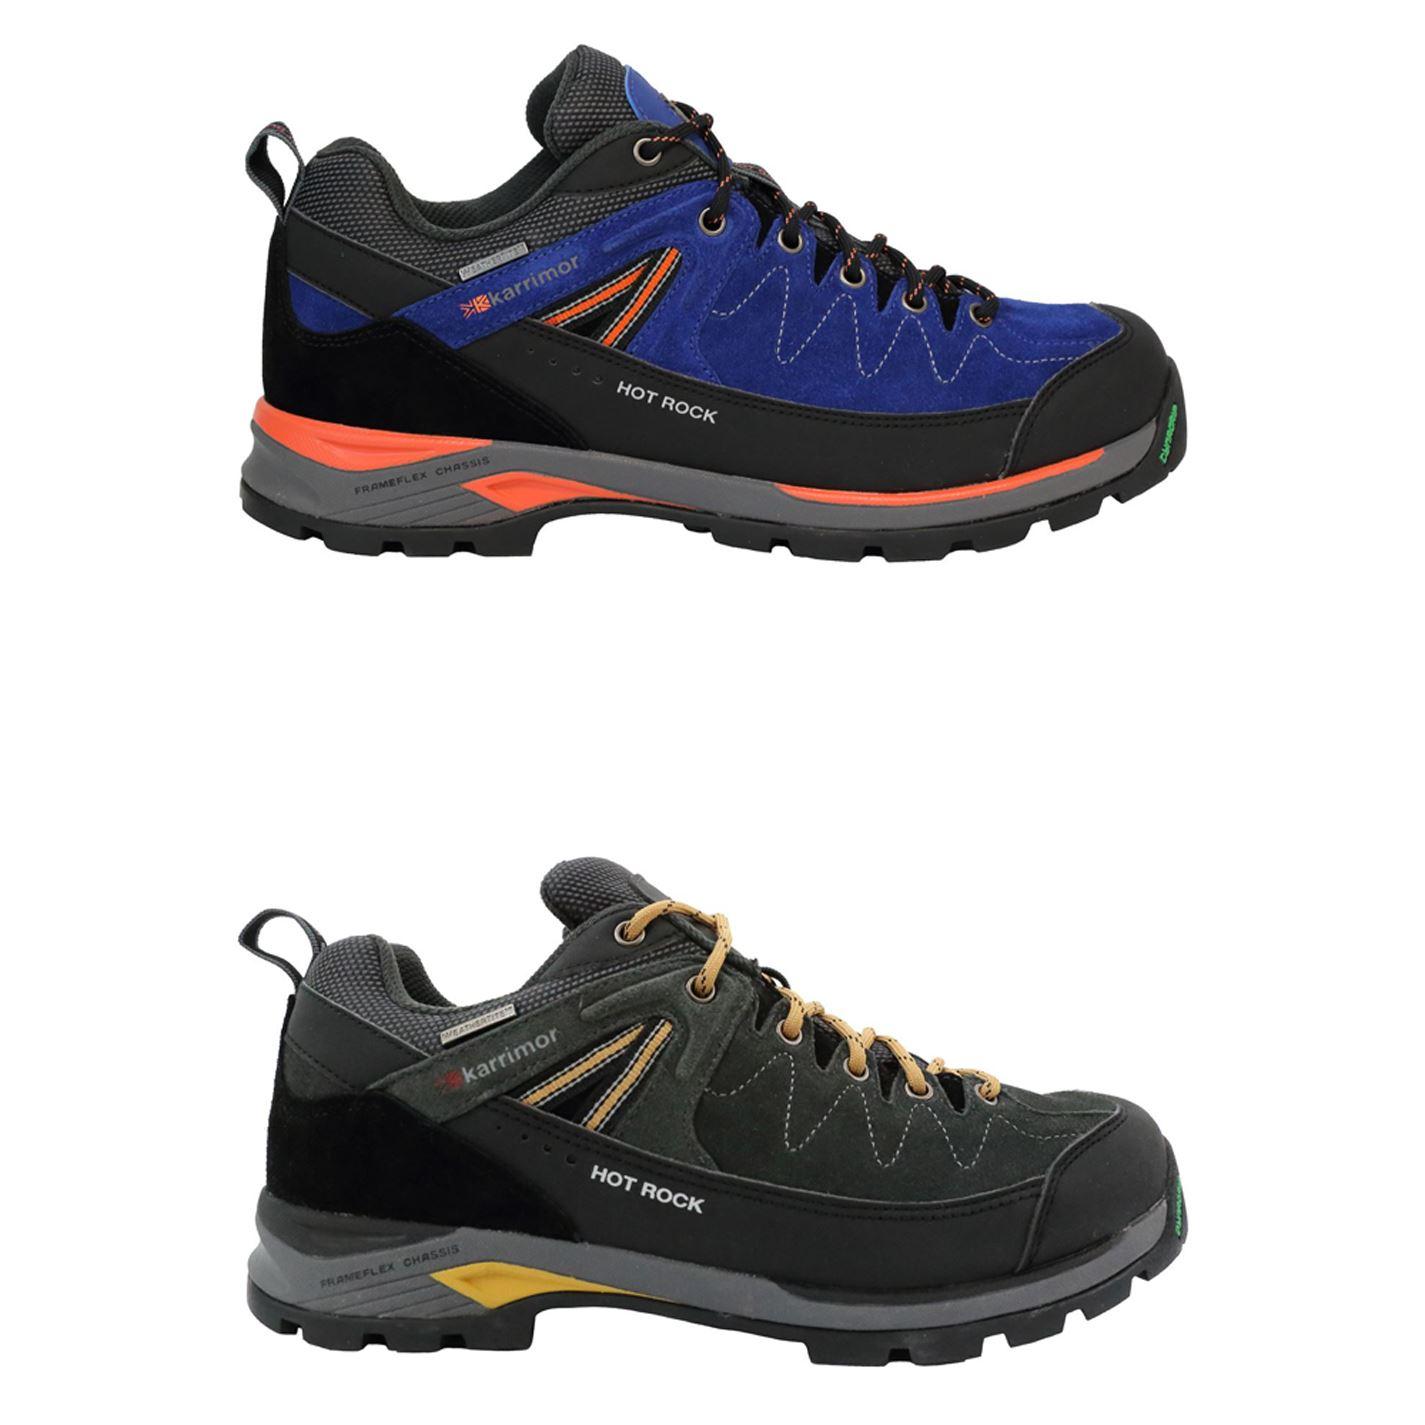 Karrimor Hot Rock Low Walking Shoes Mens Hiking Footwear Boots